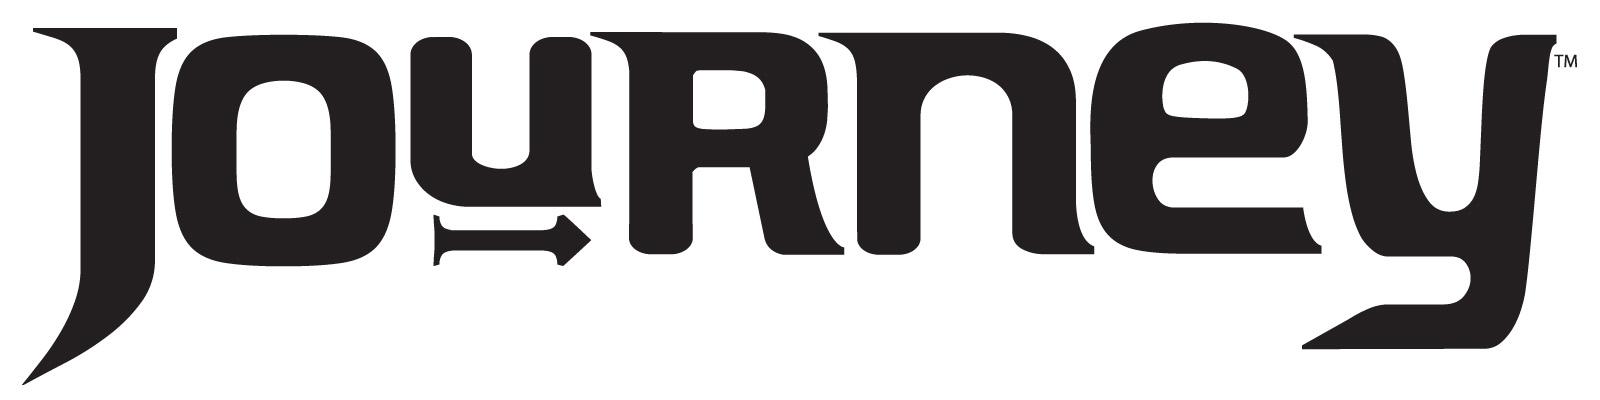 Super saturday logo. Awana clipart journey